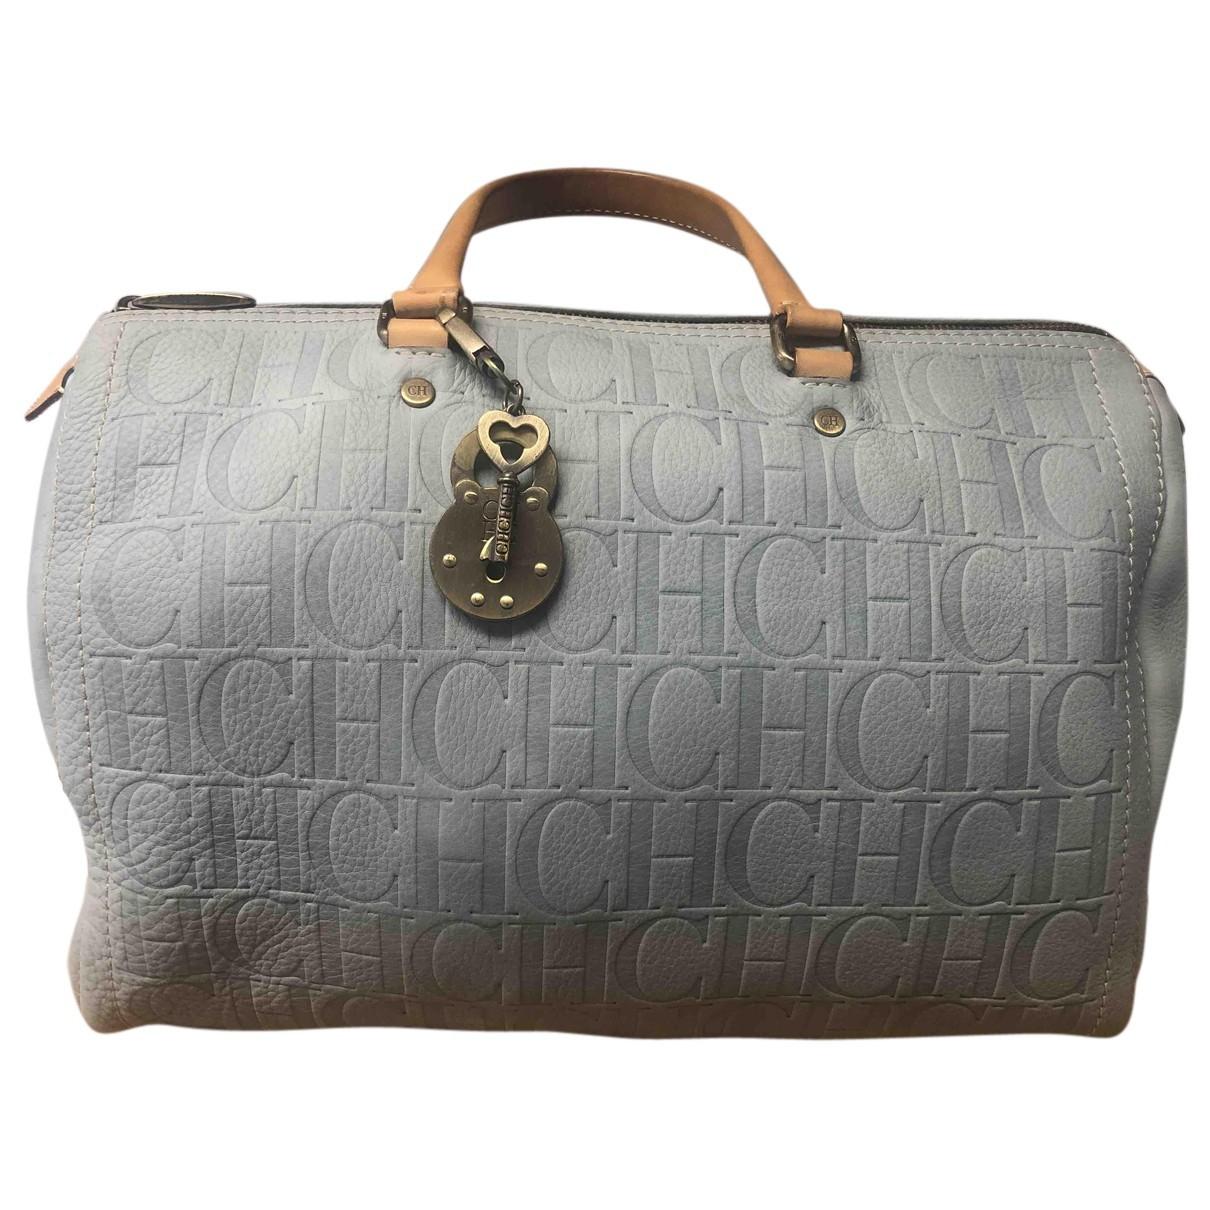 Carolina Herrera N Blue Leather handbag for Women N